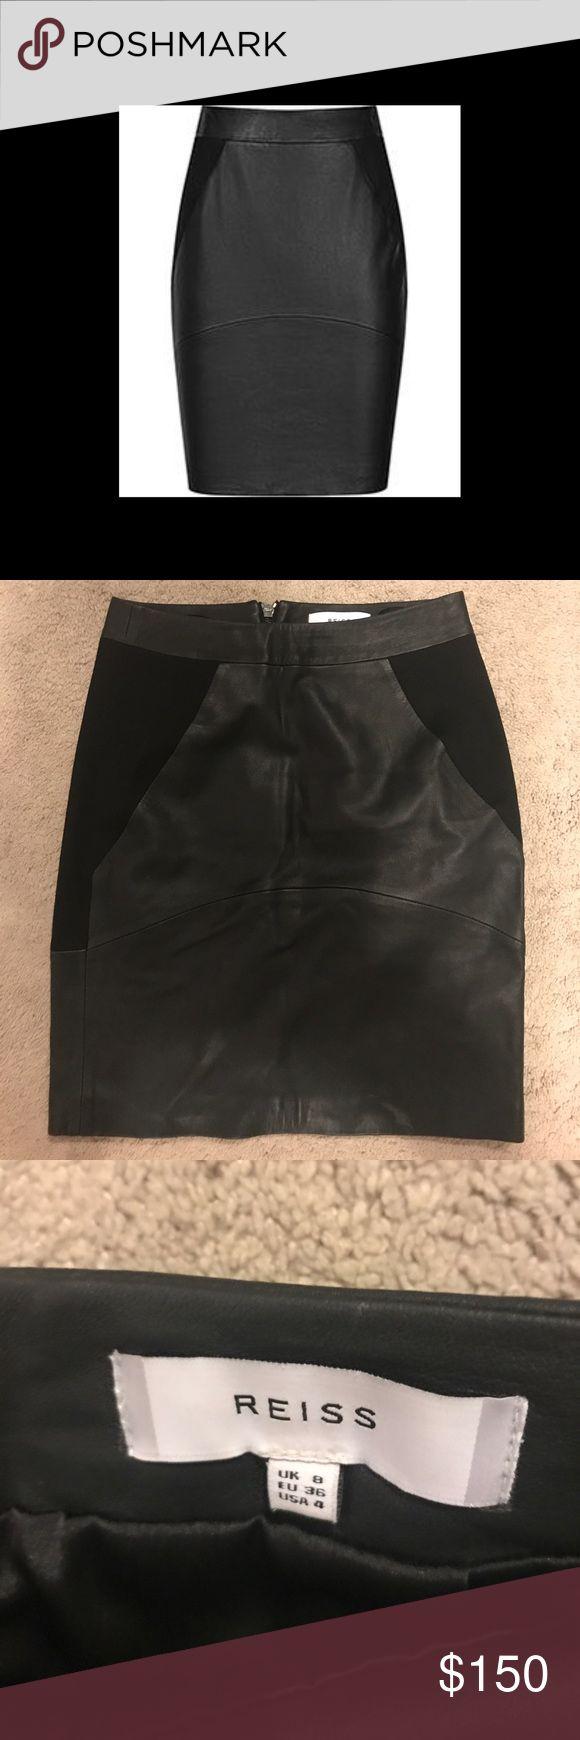 Reiss Black leather / fabric mix skirt Fabulous Reiss Black Leather/stretch fabric mix skirt! US size 4. Never worn. Reiss Skirts Mini